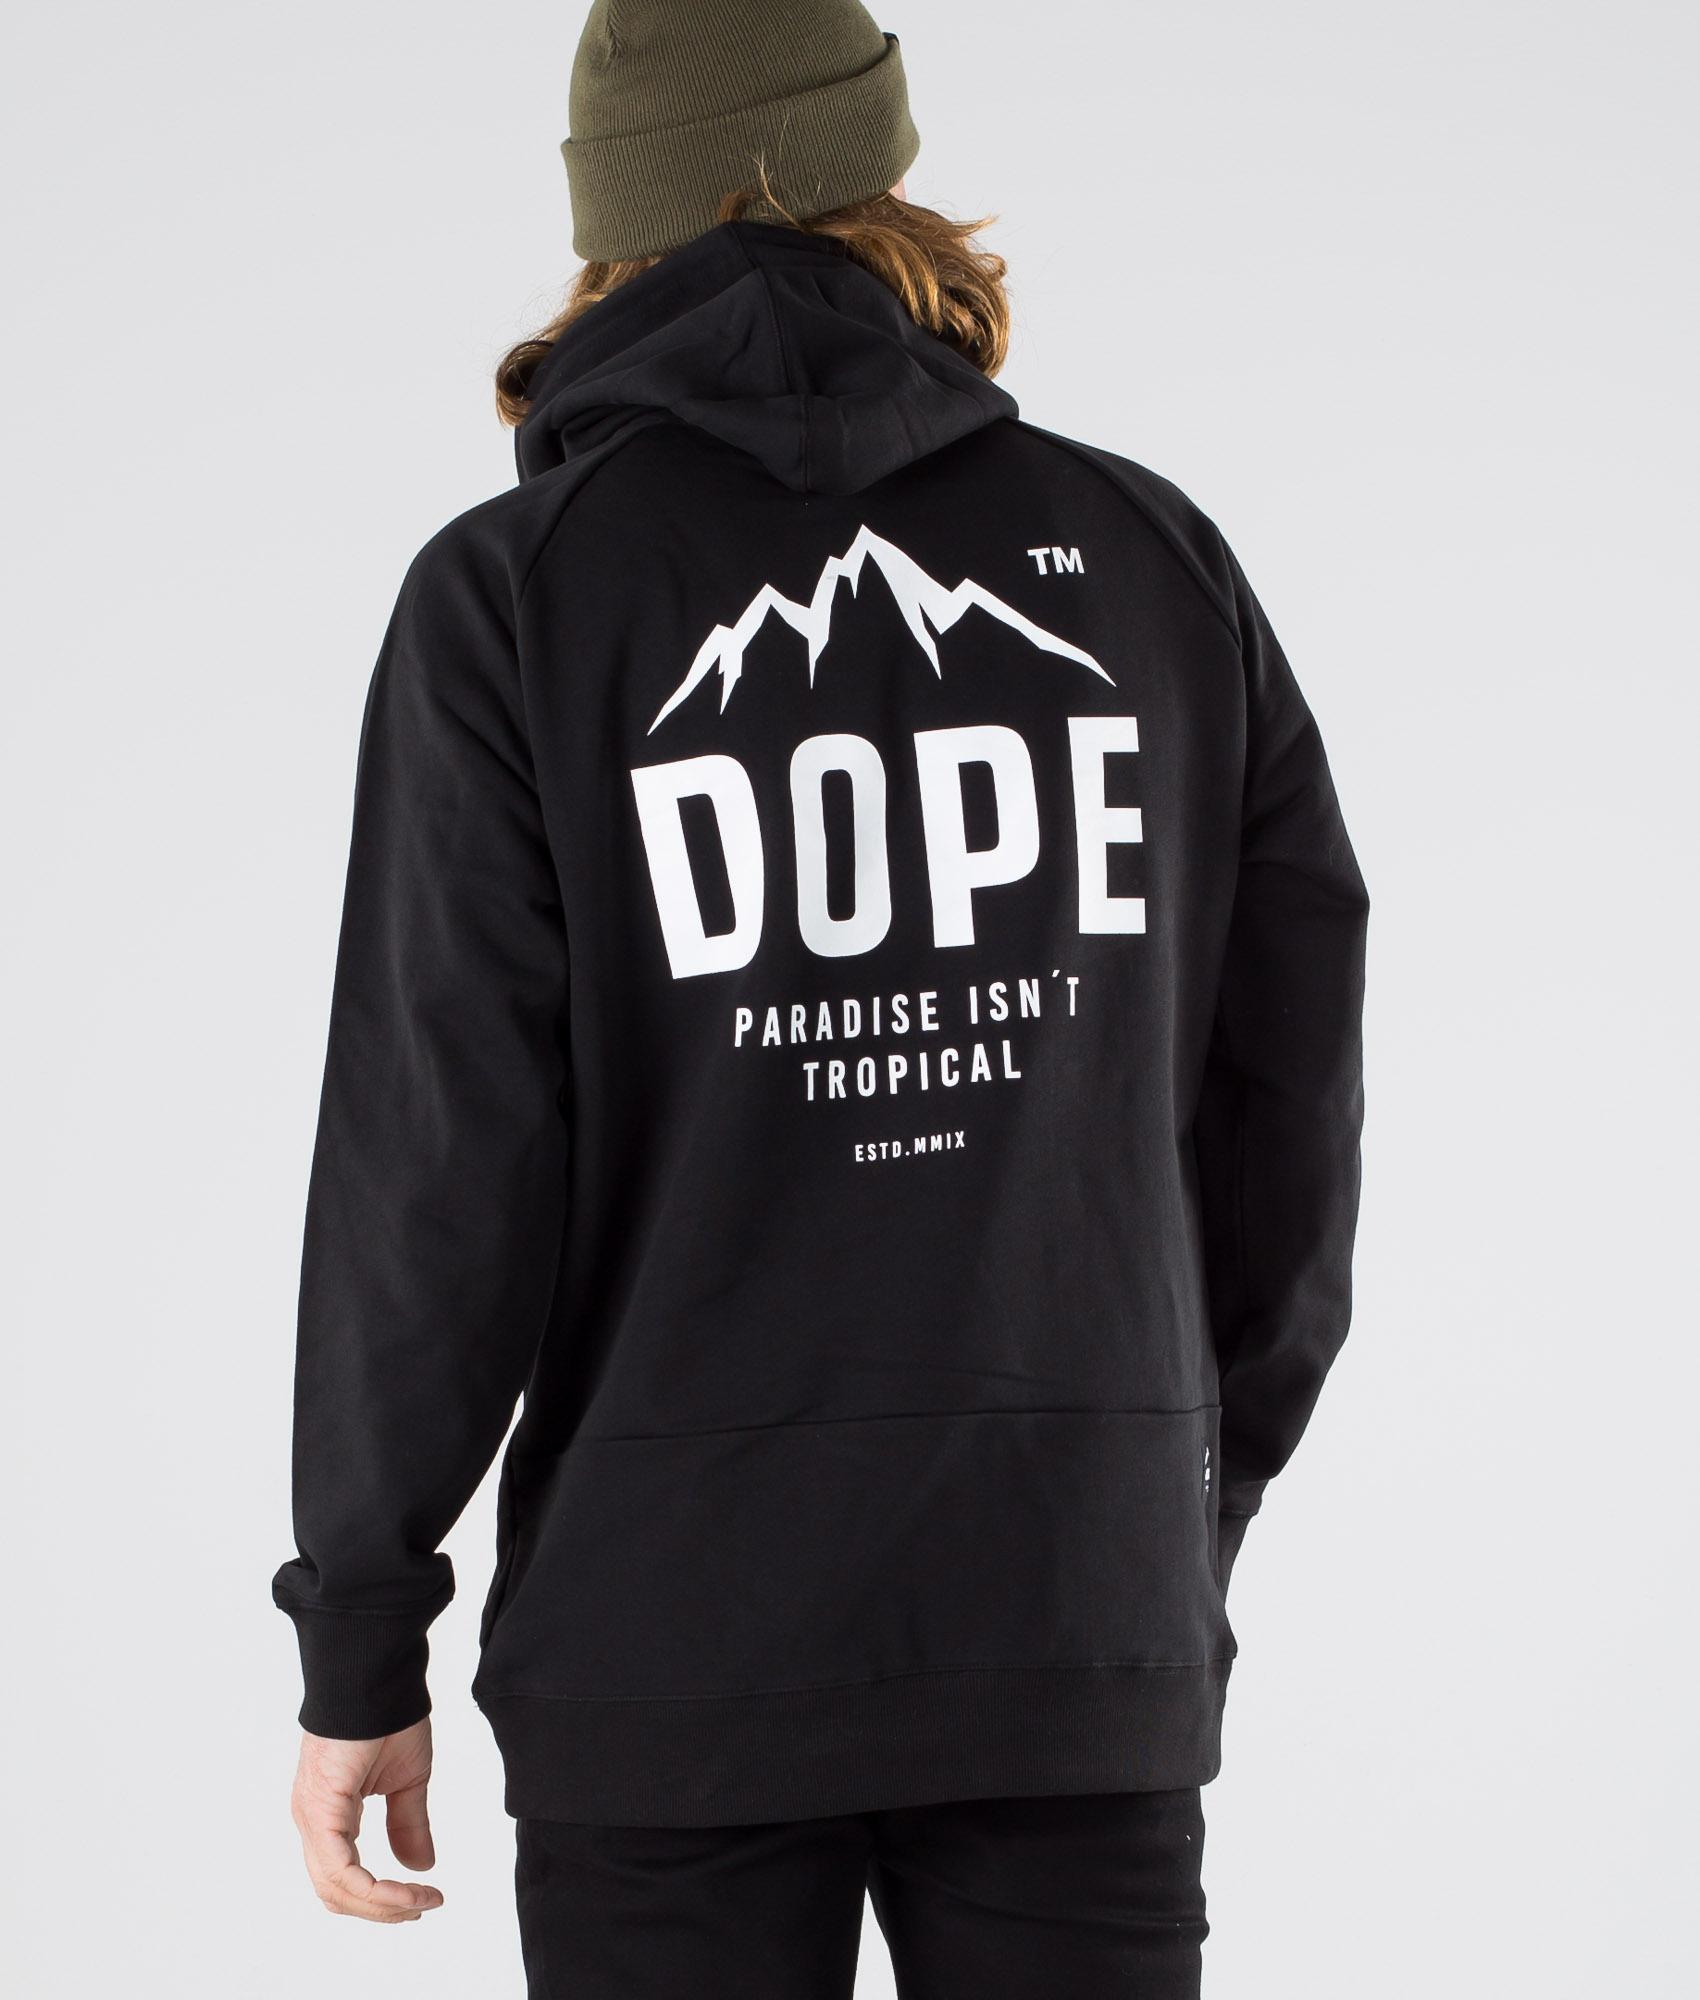 Hoodies Herr Streetwear | Fri Frakt | Ridestore.se